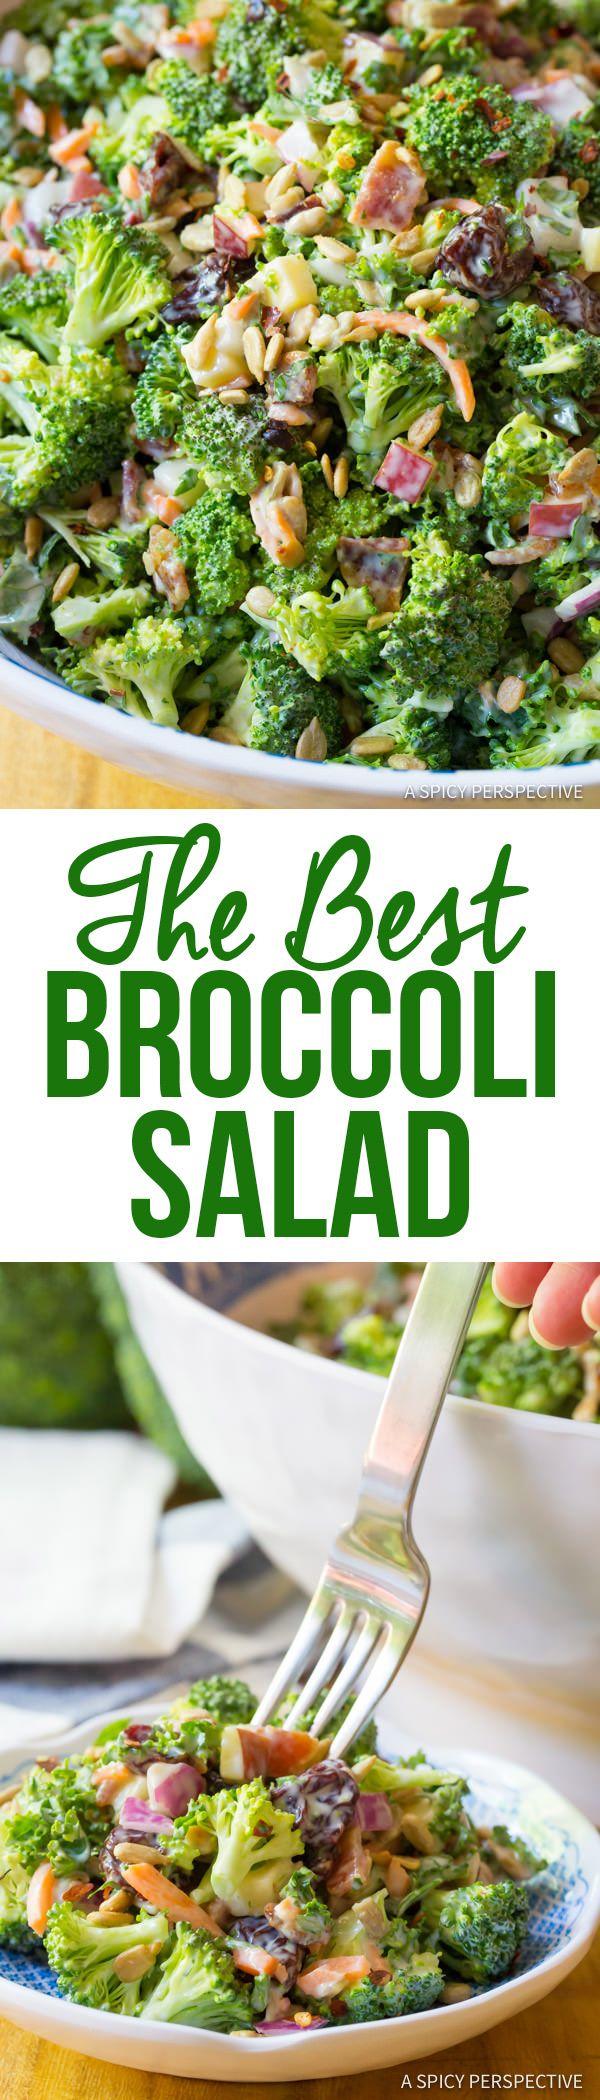 Absolutely+The+Best+Broccoli+Salad+Recipe+|+ASpicyPerspective.com+via+@spicyperspectiv